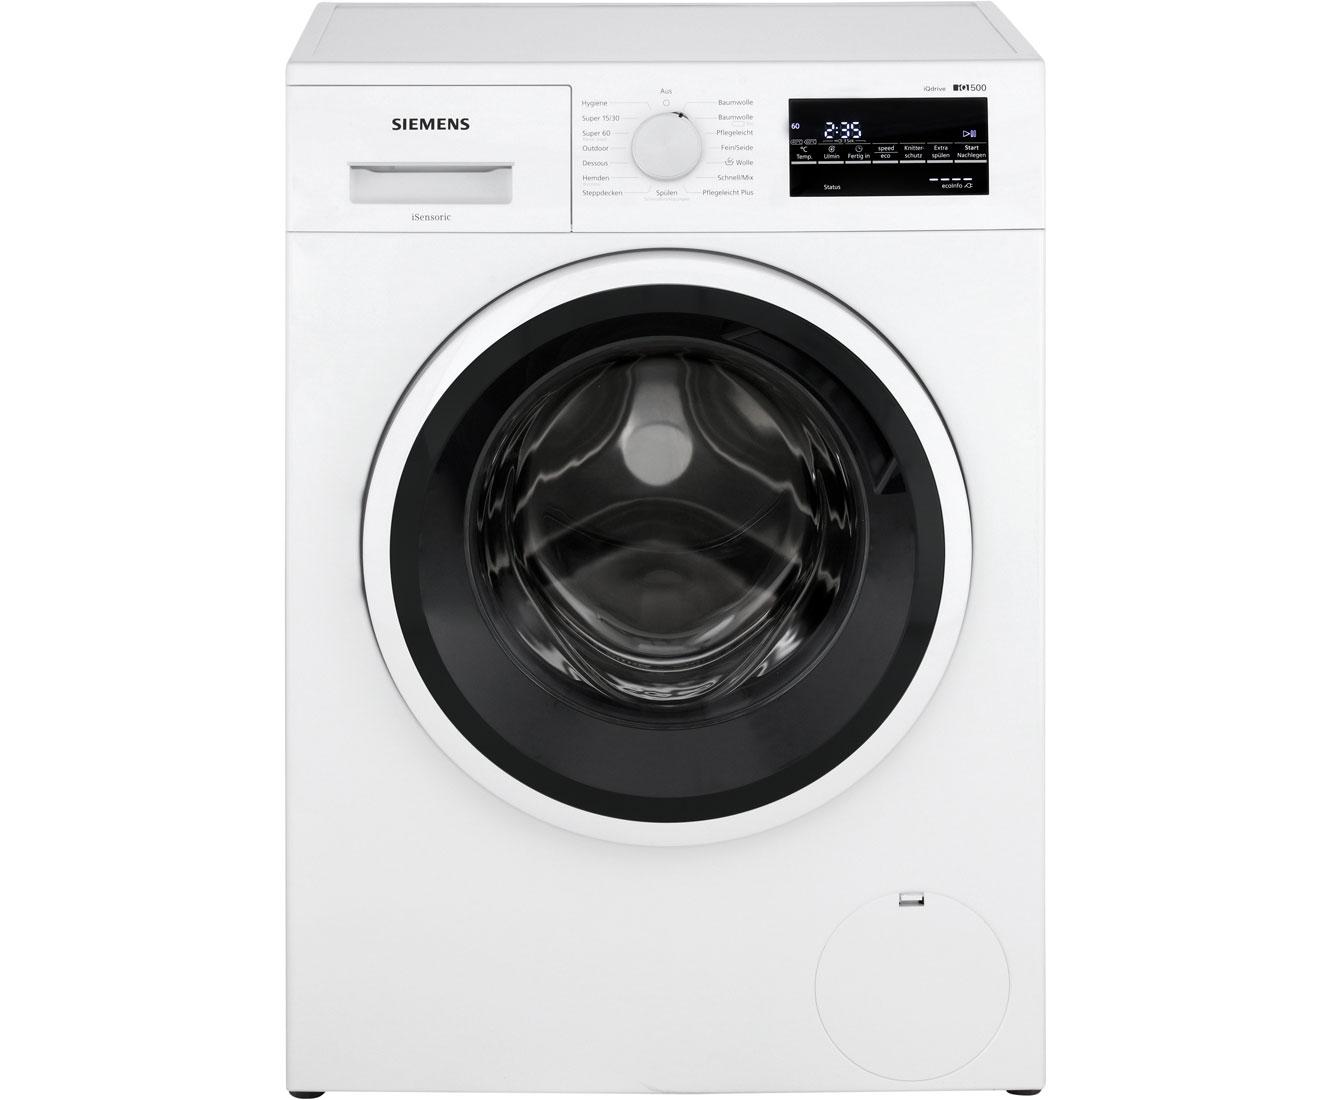 Siemens iq500 wm14t421 waschmaschine 7 kg 1400 u min a